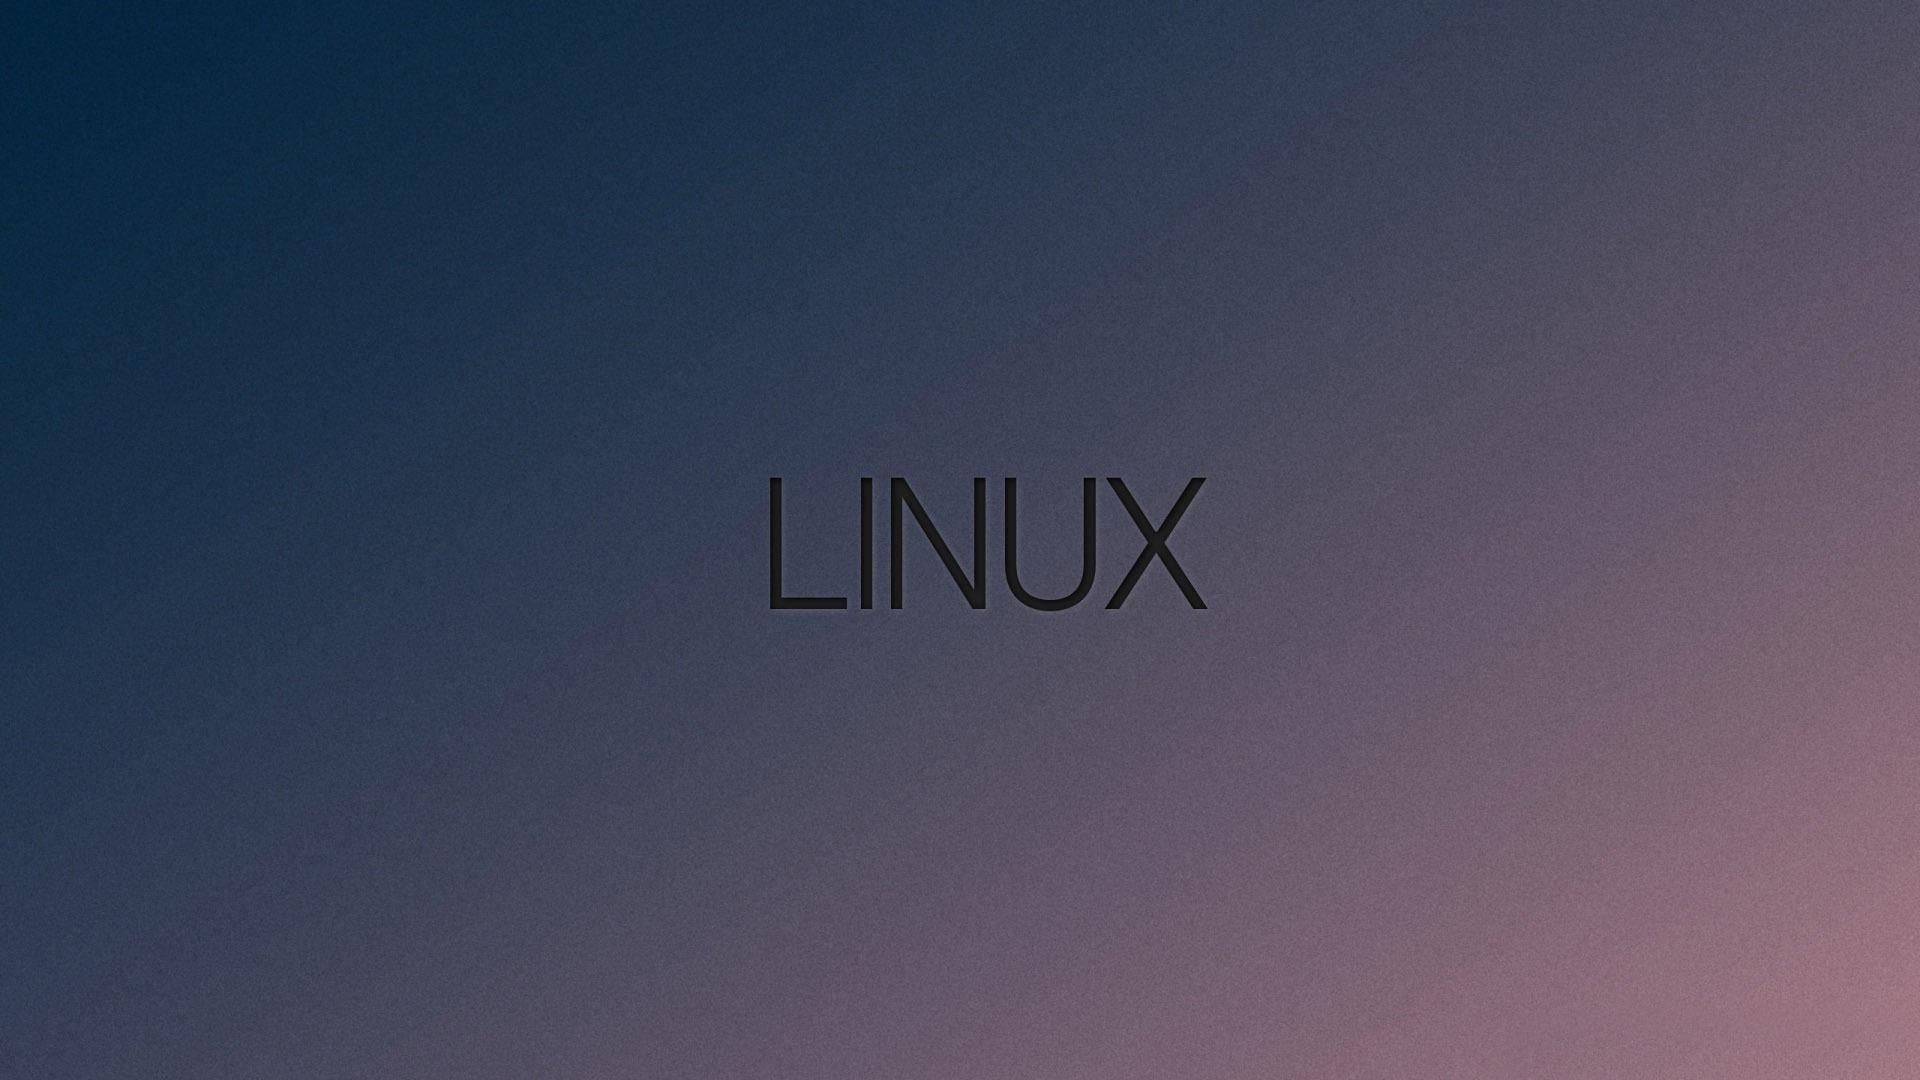 Linux wallpaper   716998 1920x1080